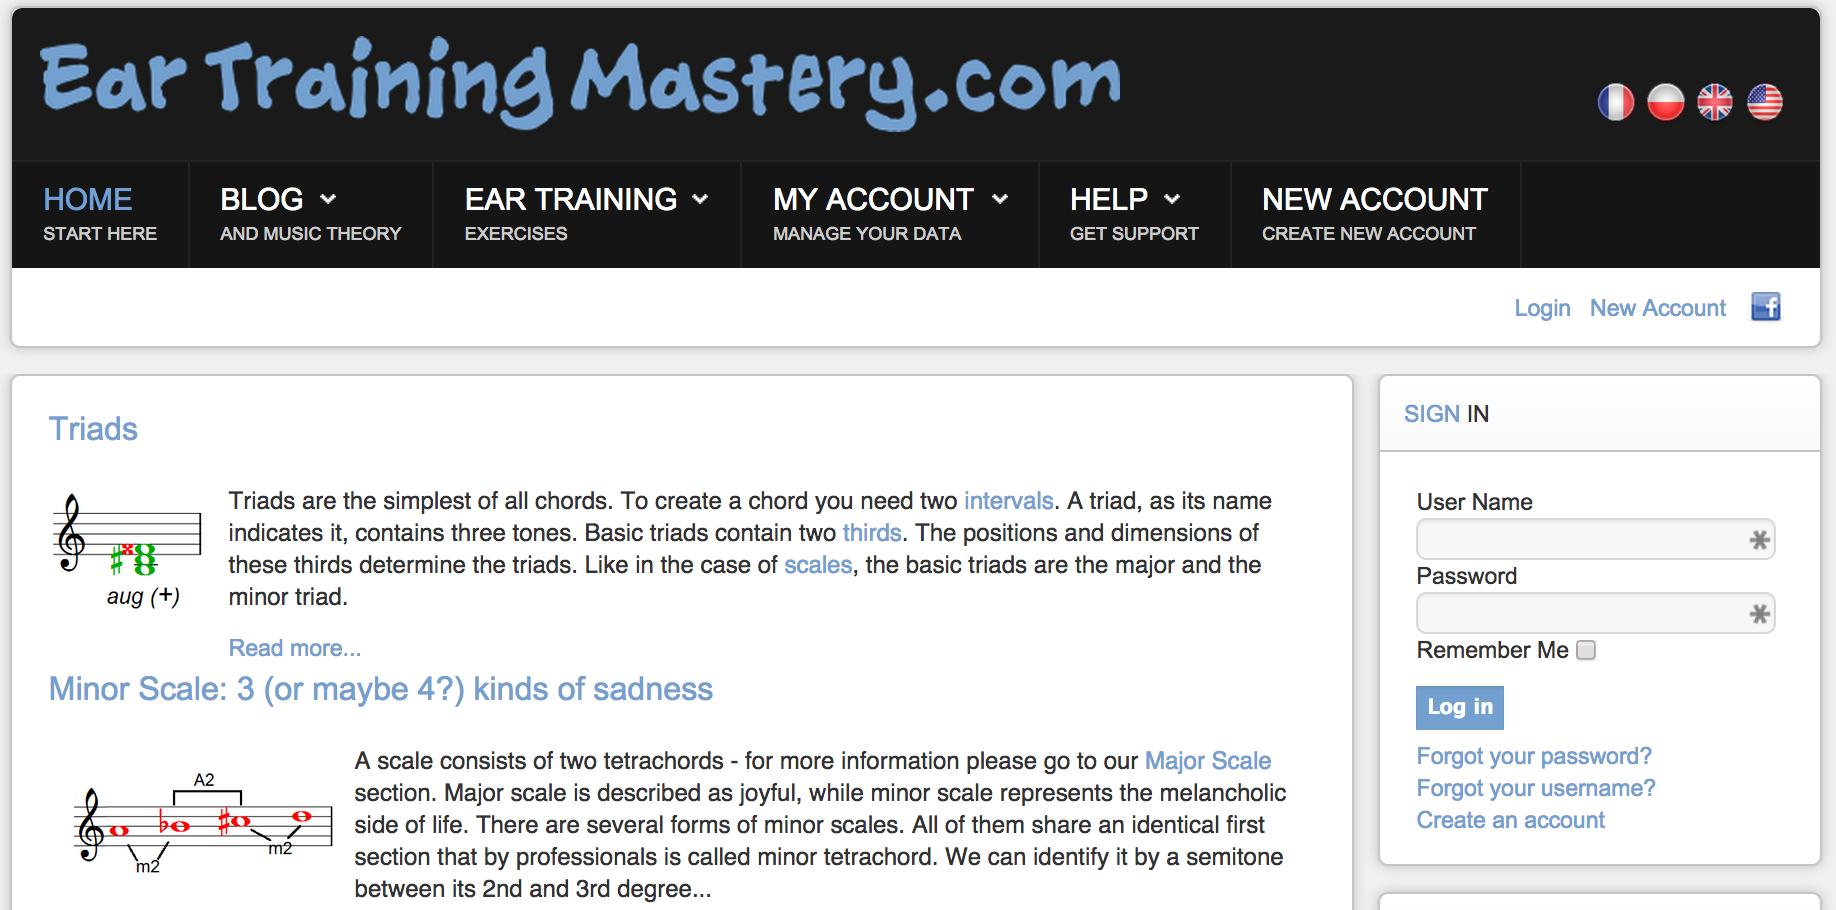 Ear Training Mastery